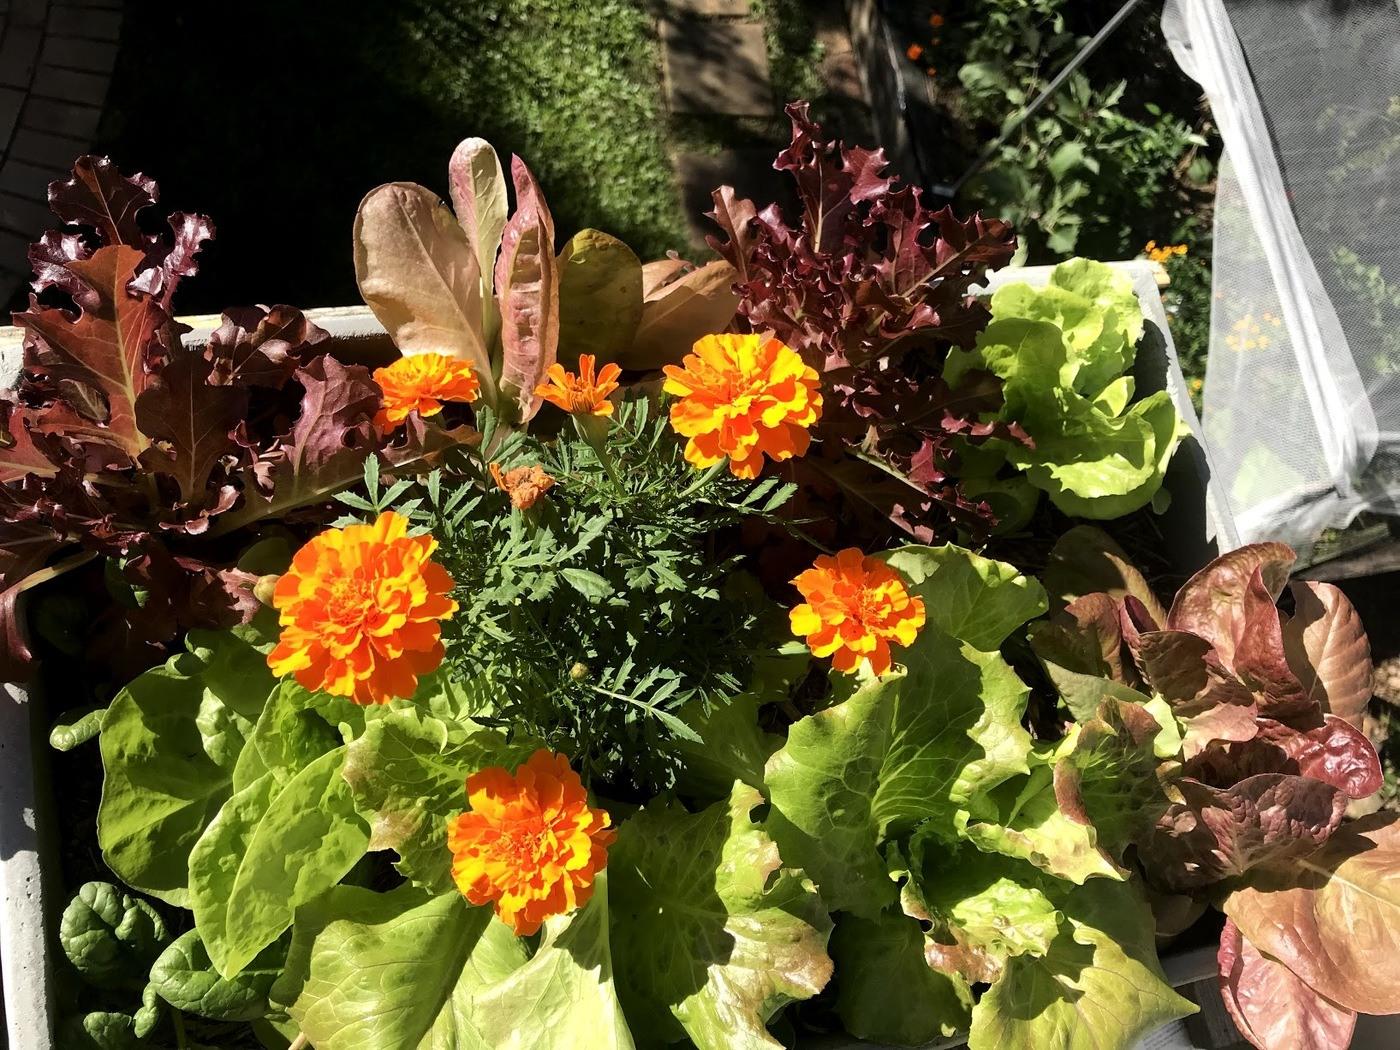 Marigolds in Lettuce